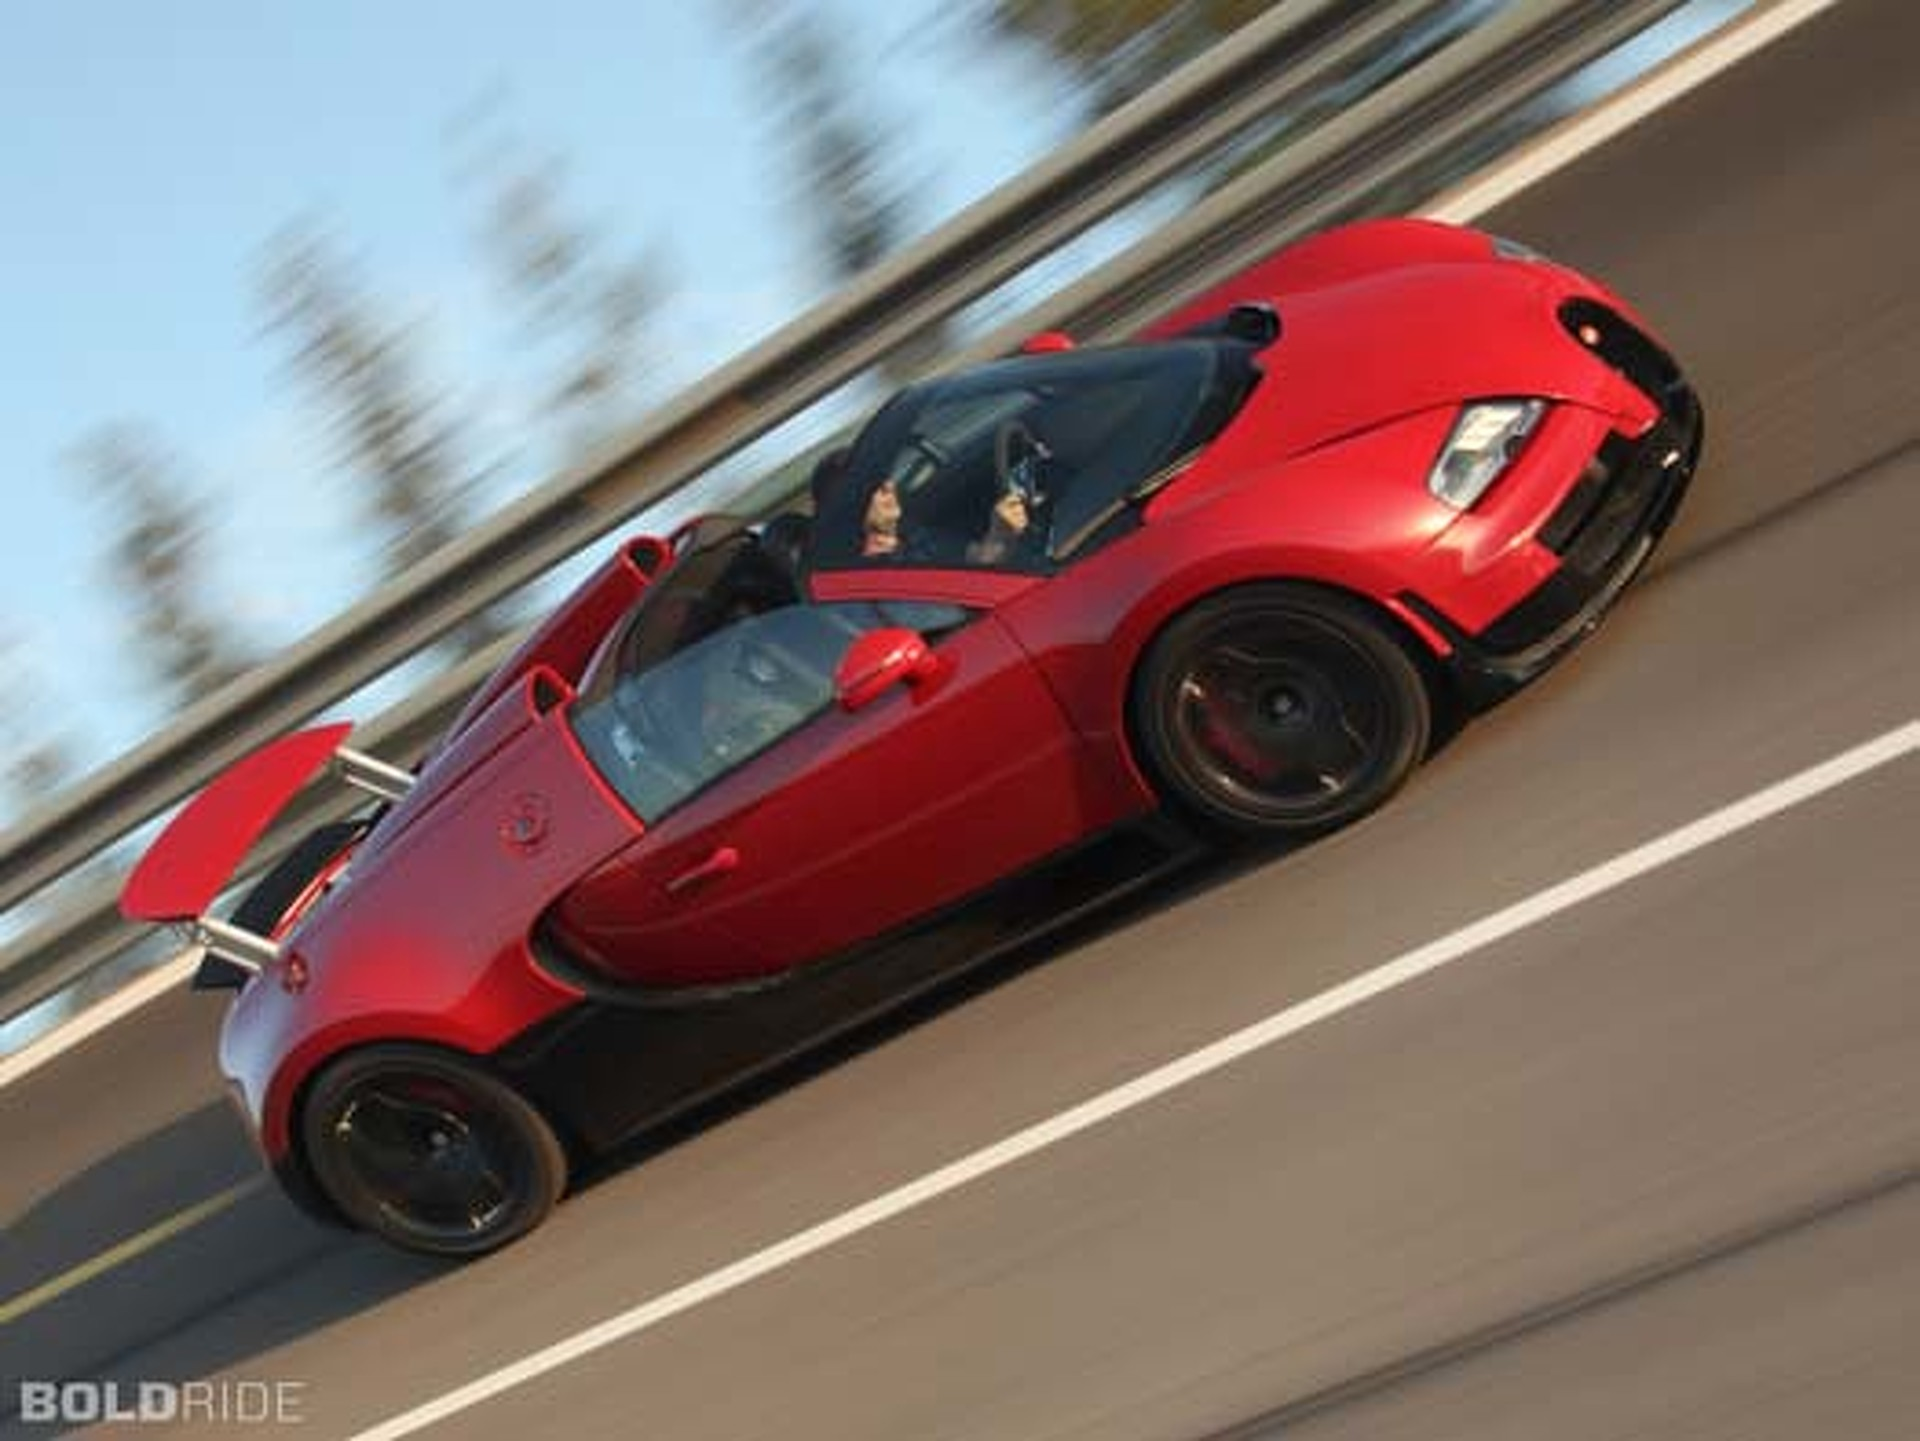 pagani-huayra-vs-bugatti-veyron-grandsport-vitesse-behind-the-scenes Interesting Bugatti Veyron Grand Sport Vitesse Vs Pagani Huayra Cars Trend